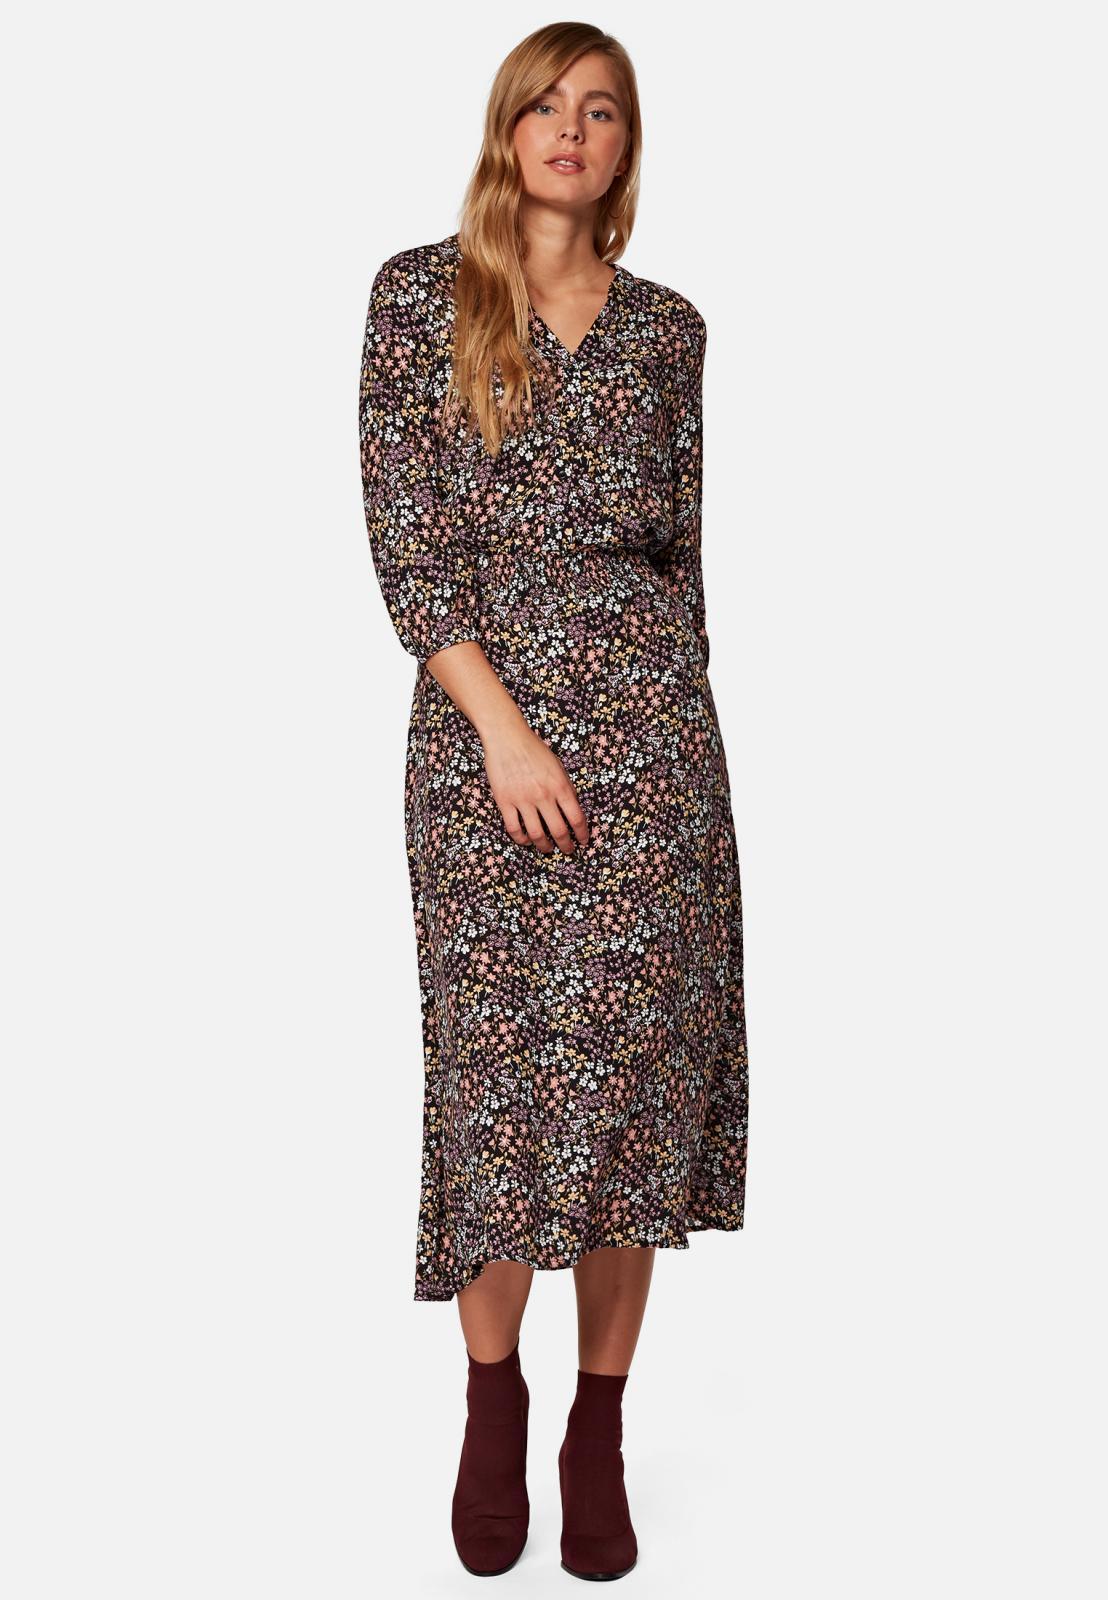 Mavi KLEID | Midi-Kleid mit Blumenmuster aus Viscose